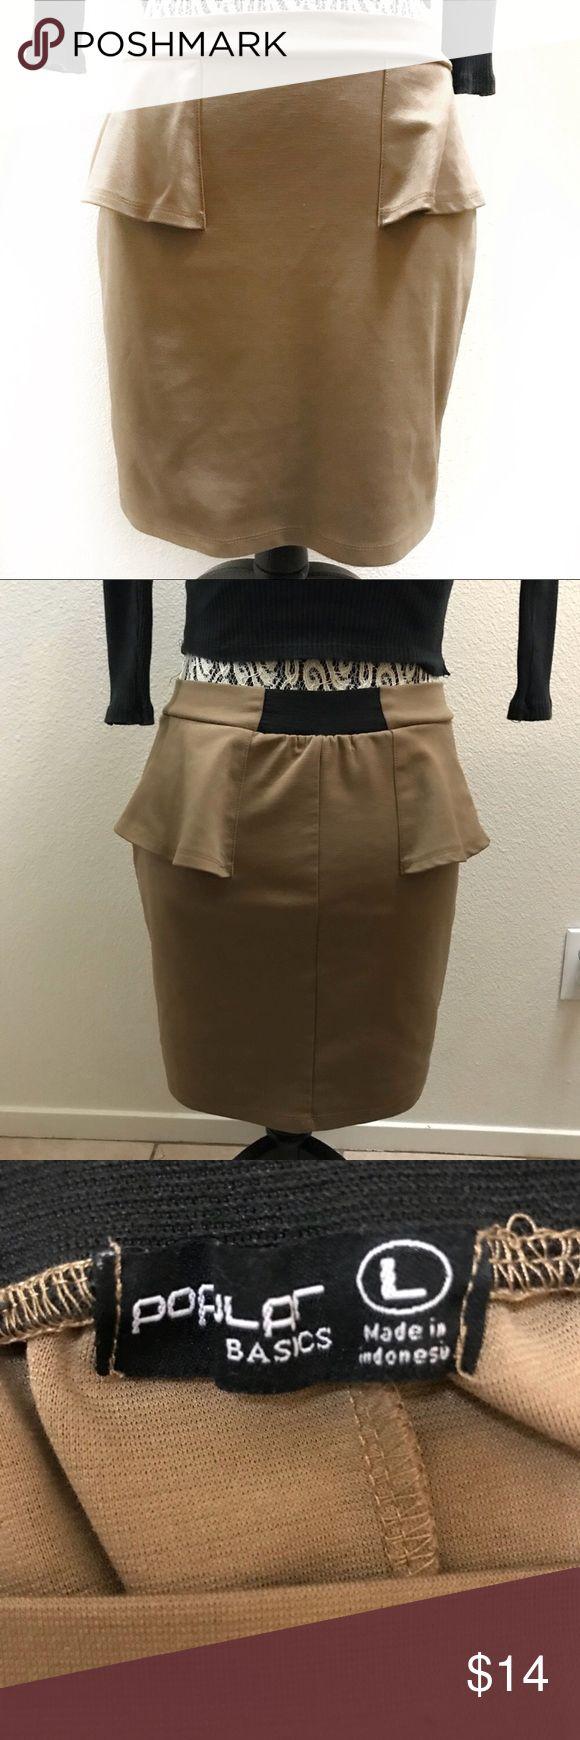 "Popular Basics peplum skirt large Waist 26"" Length 16"" Popular Basics Skirts Mini"